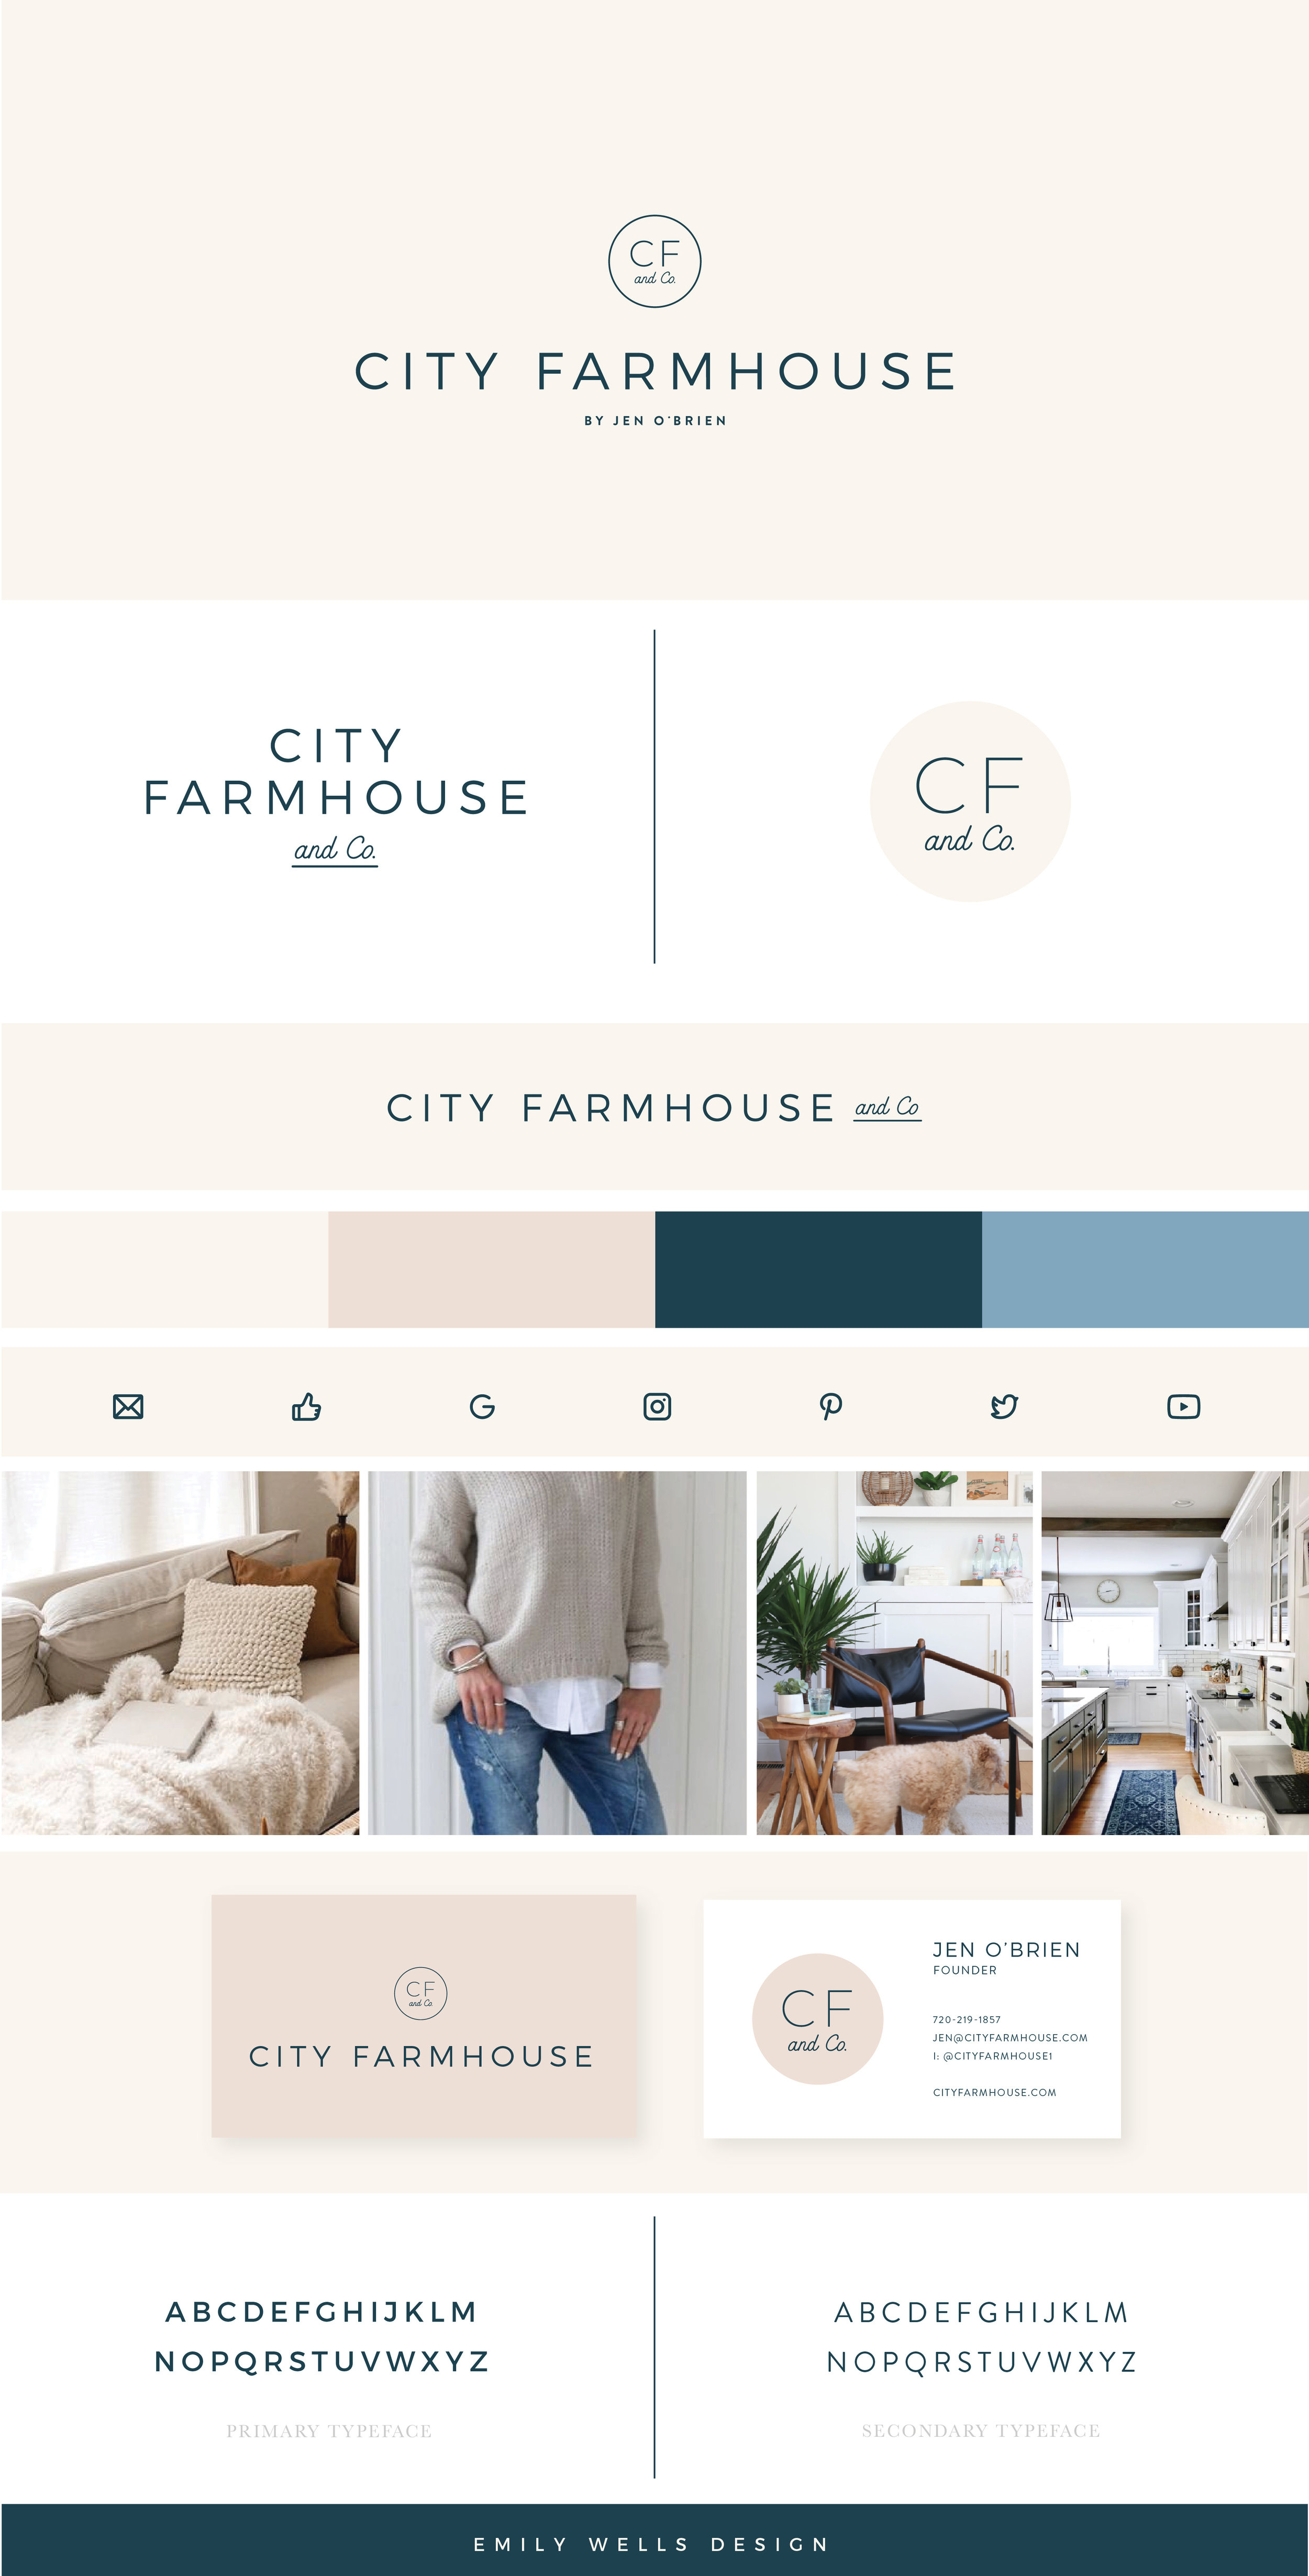 CityFarmhouse-BrandBoard-RGB-01.jpg